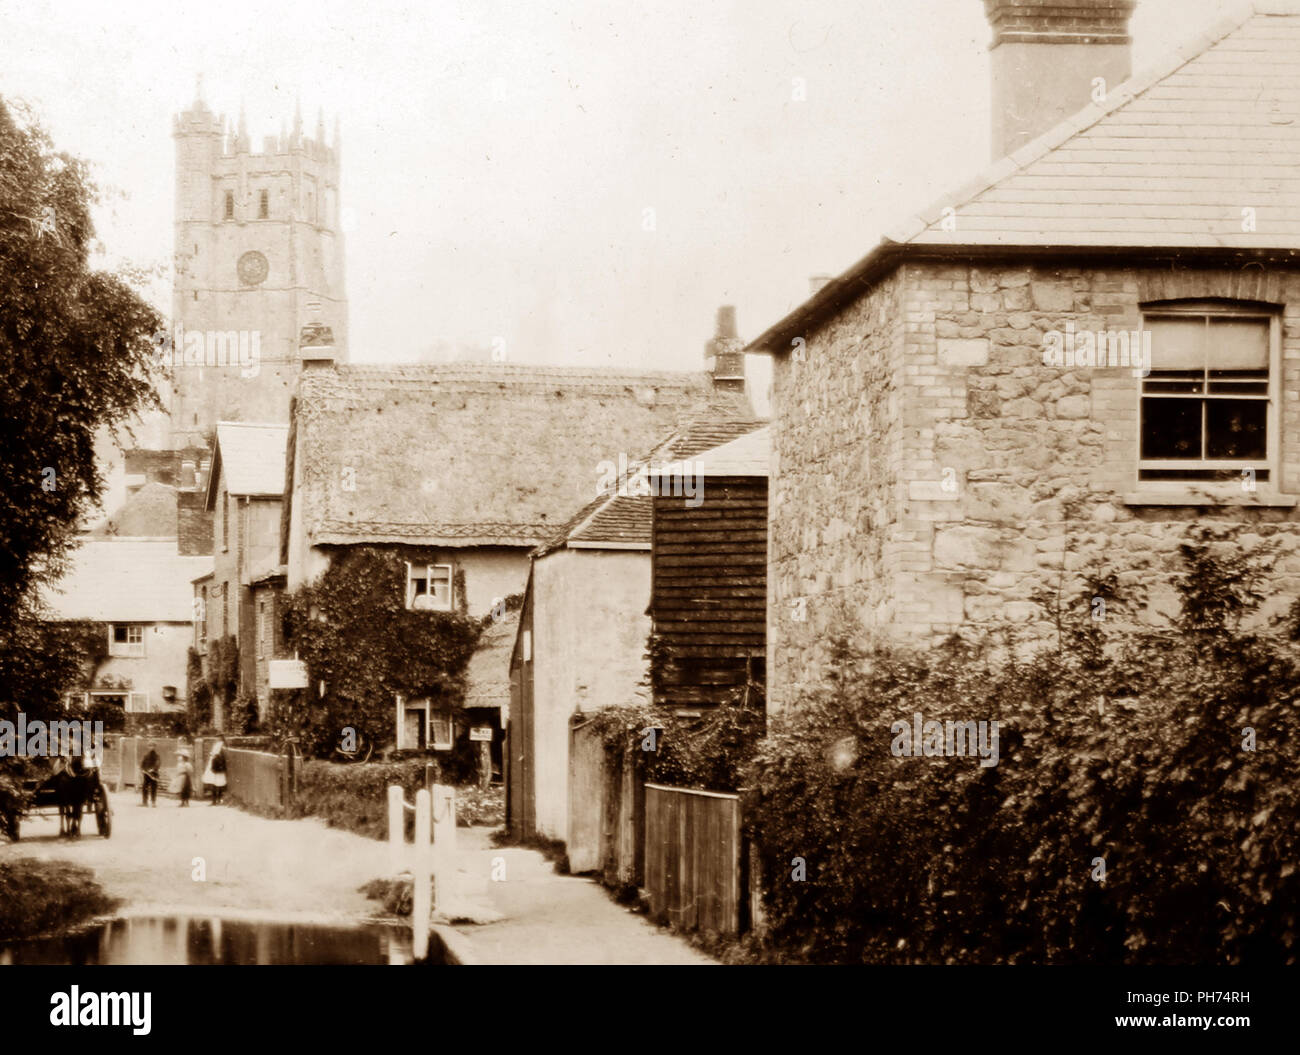 Carisbrooke, Isle of Wight, early 1900s - Stock Image